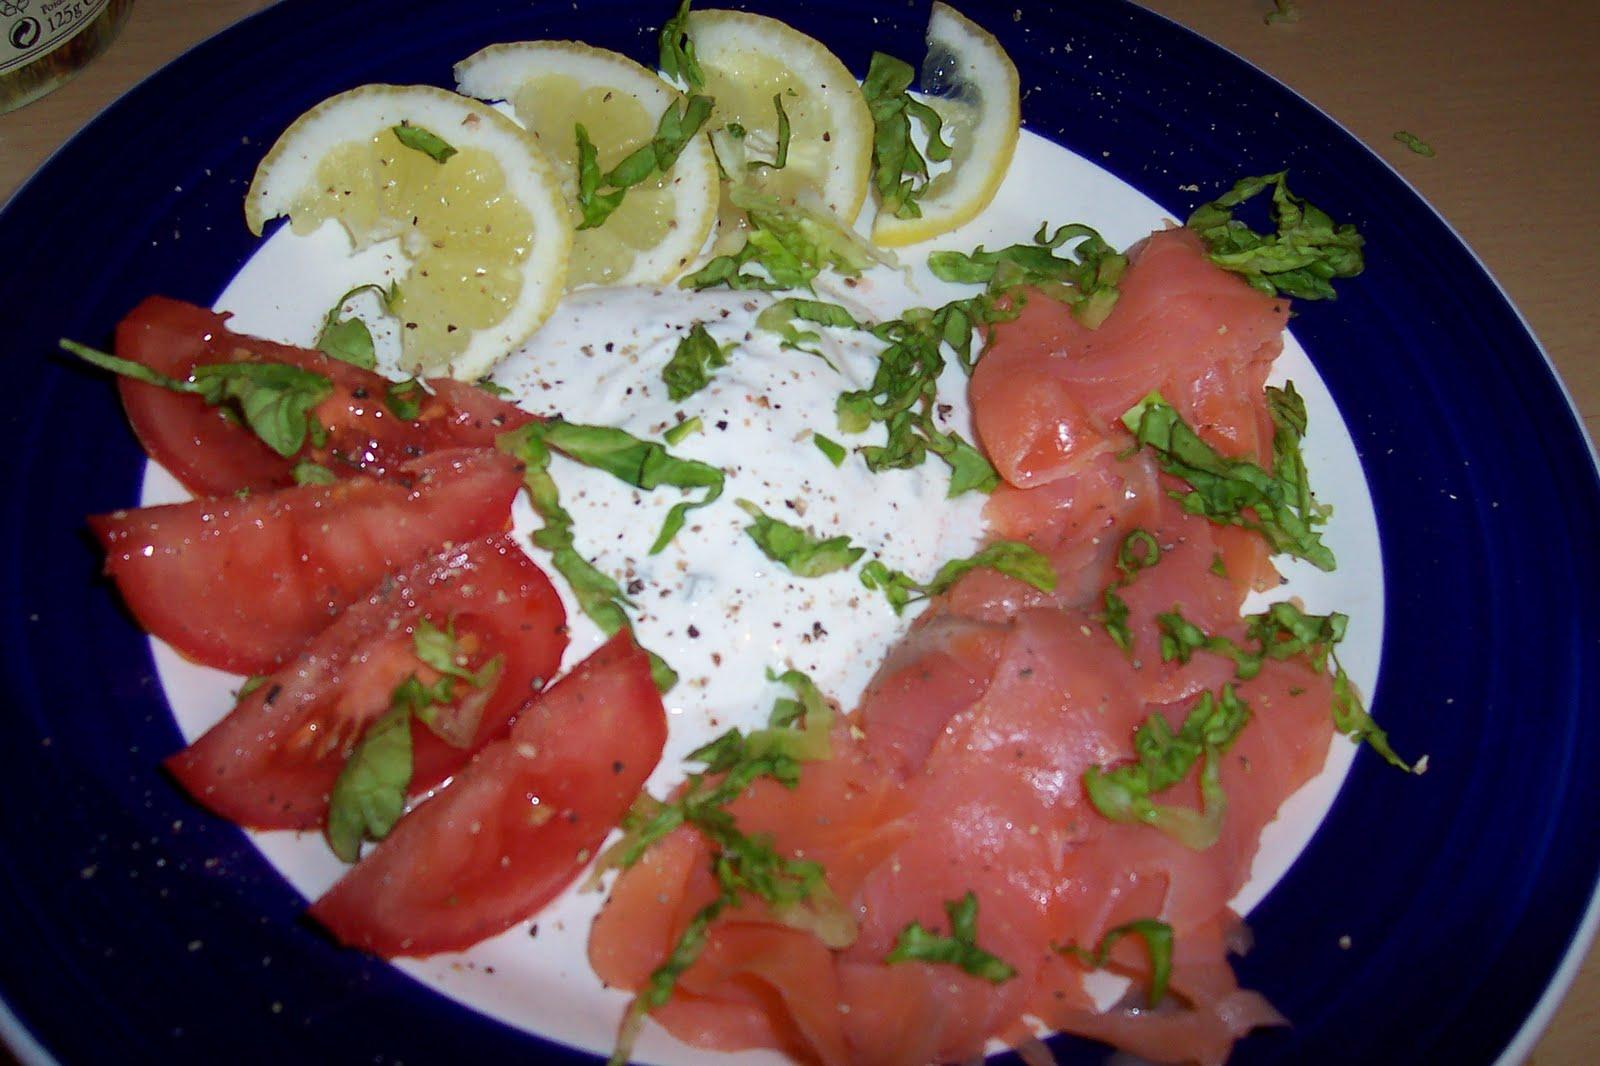 La cuisine de lili 39 salades co - La cuisine de lili ...